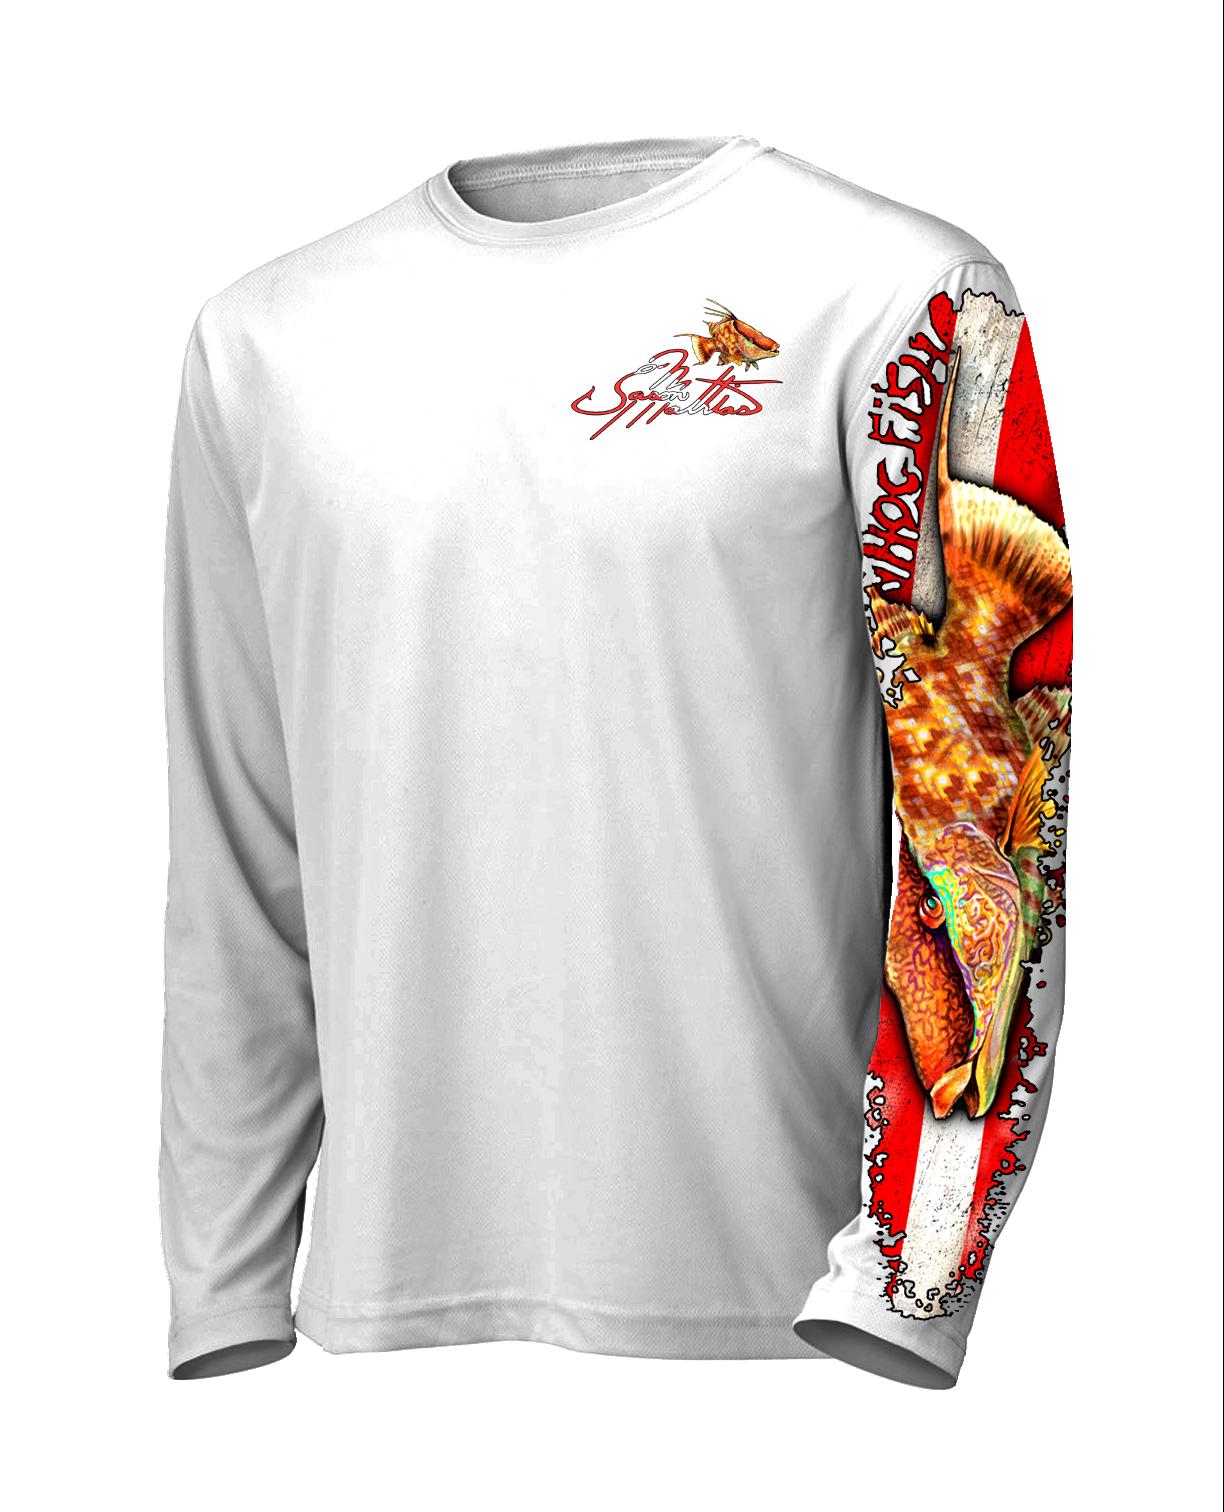 jason-mathias-shirt-line-front-hogfish-dive-shirt.png